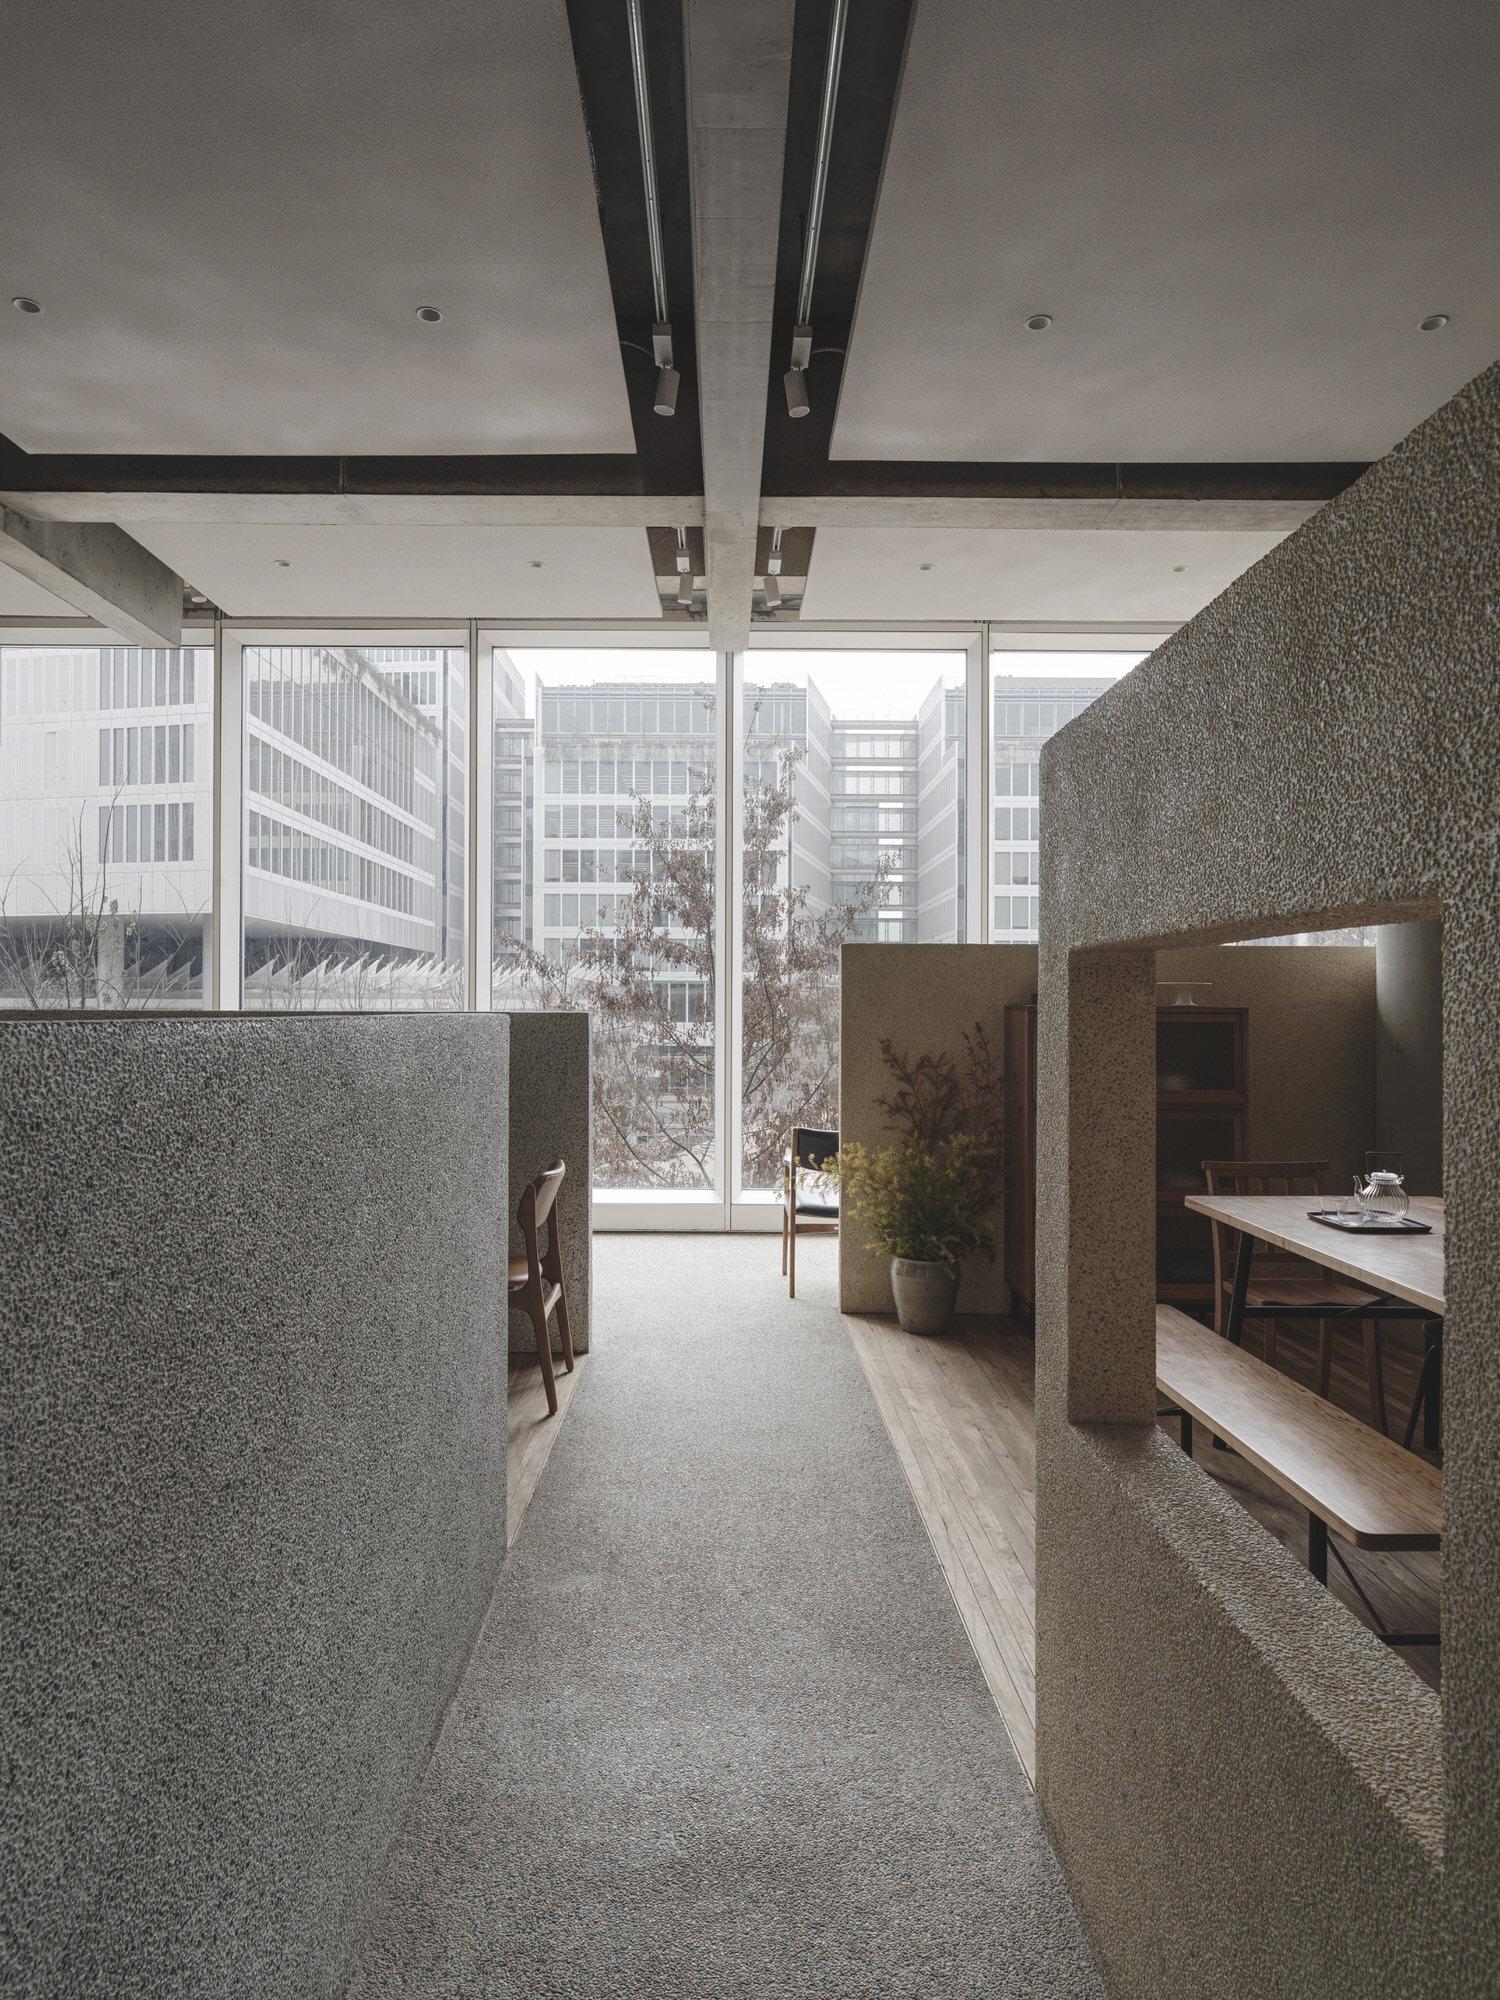 Blue Architecture Studio Lost Found Hangzhou Photo Tantan Lei Yellowtrace 15